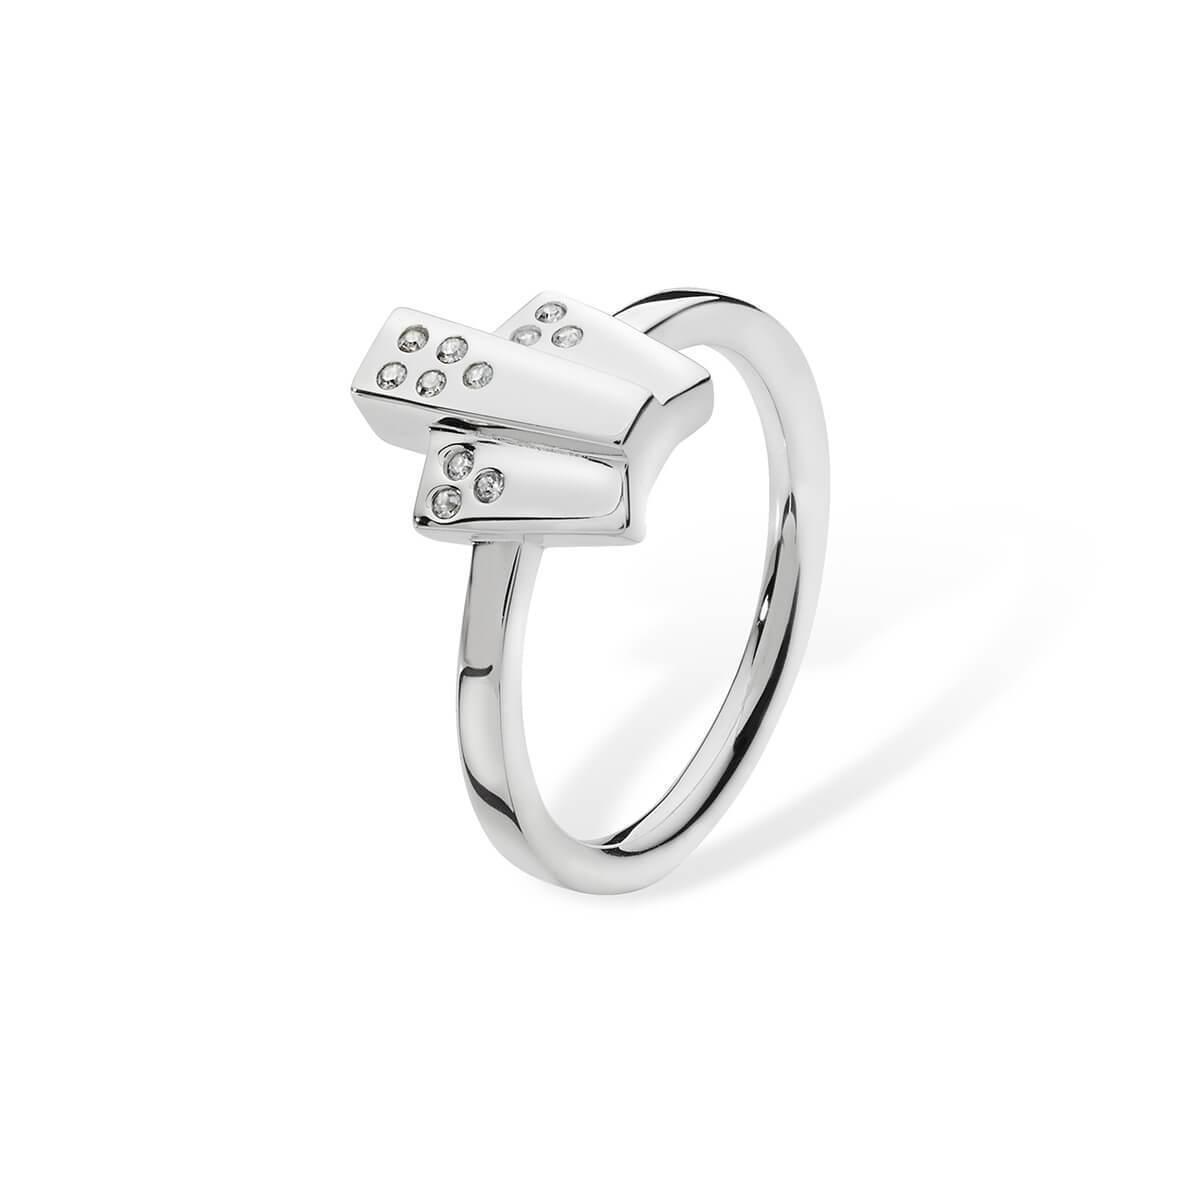 Lucy Quartermaine 2 Ring Drop Silver - UK T - US 9 5/8 - EU 61 1/2 fFLyLhkCK